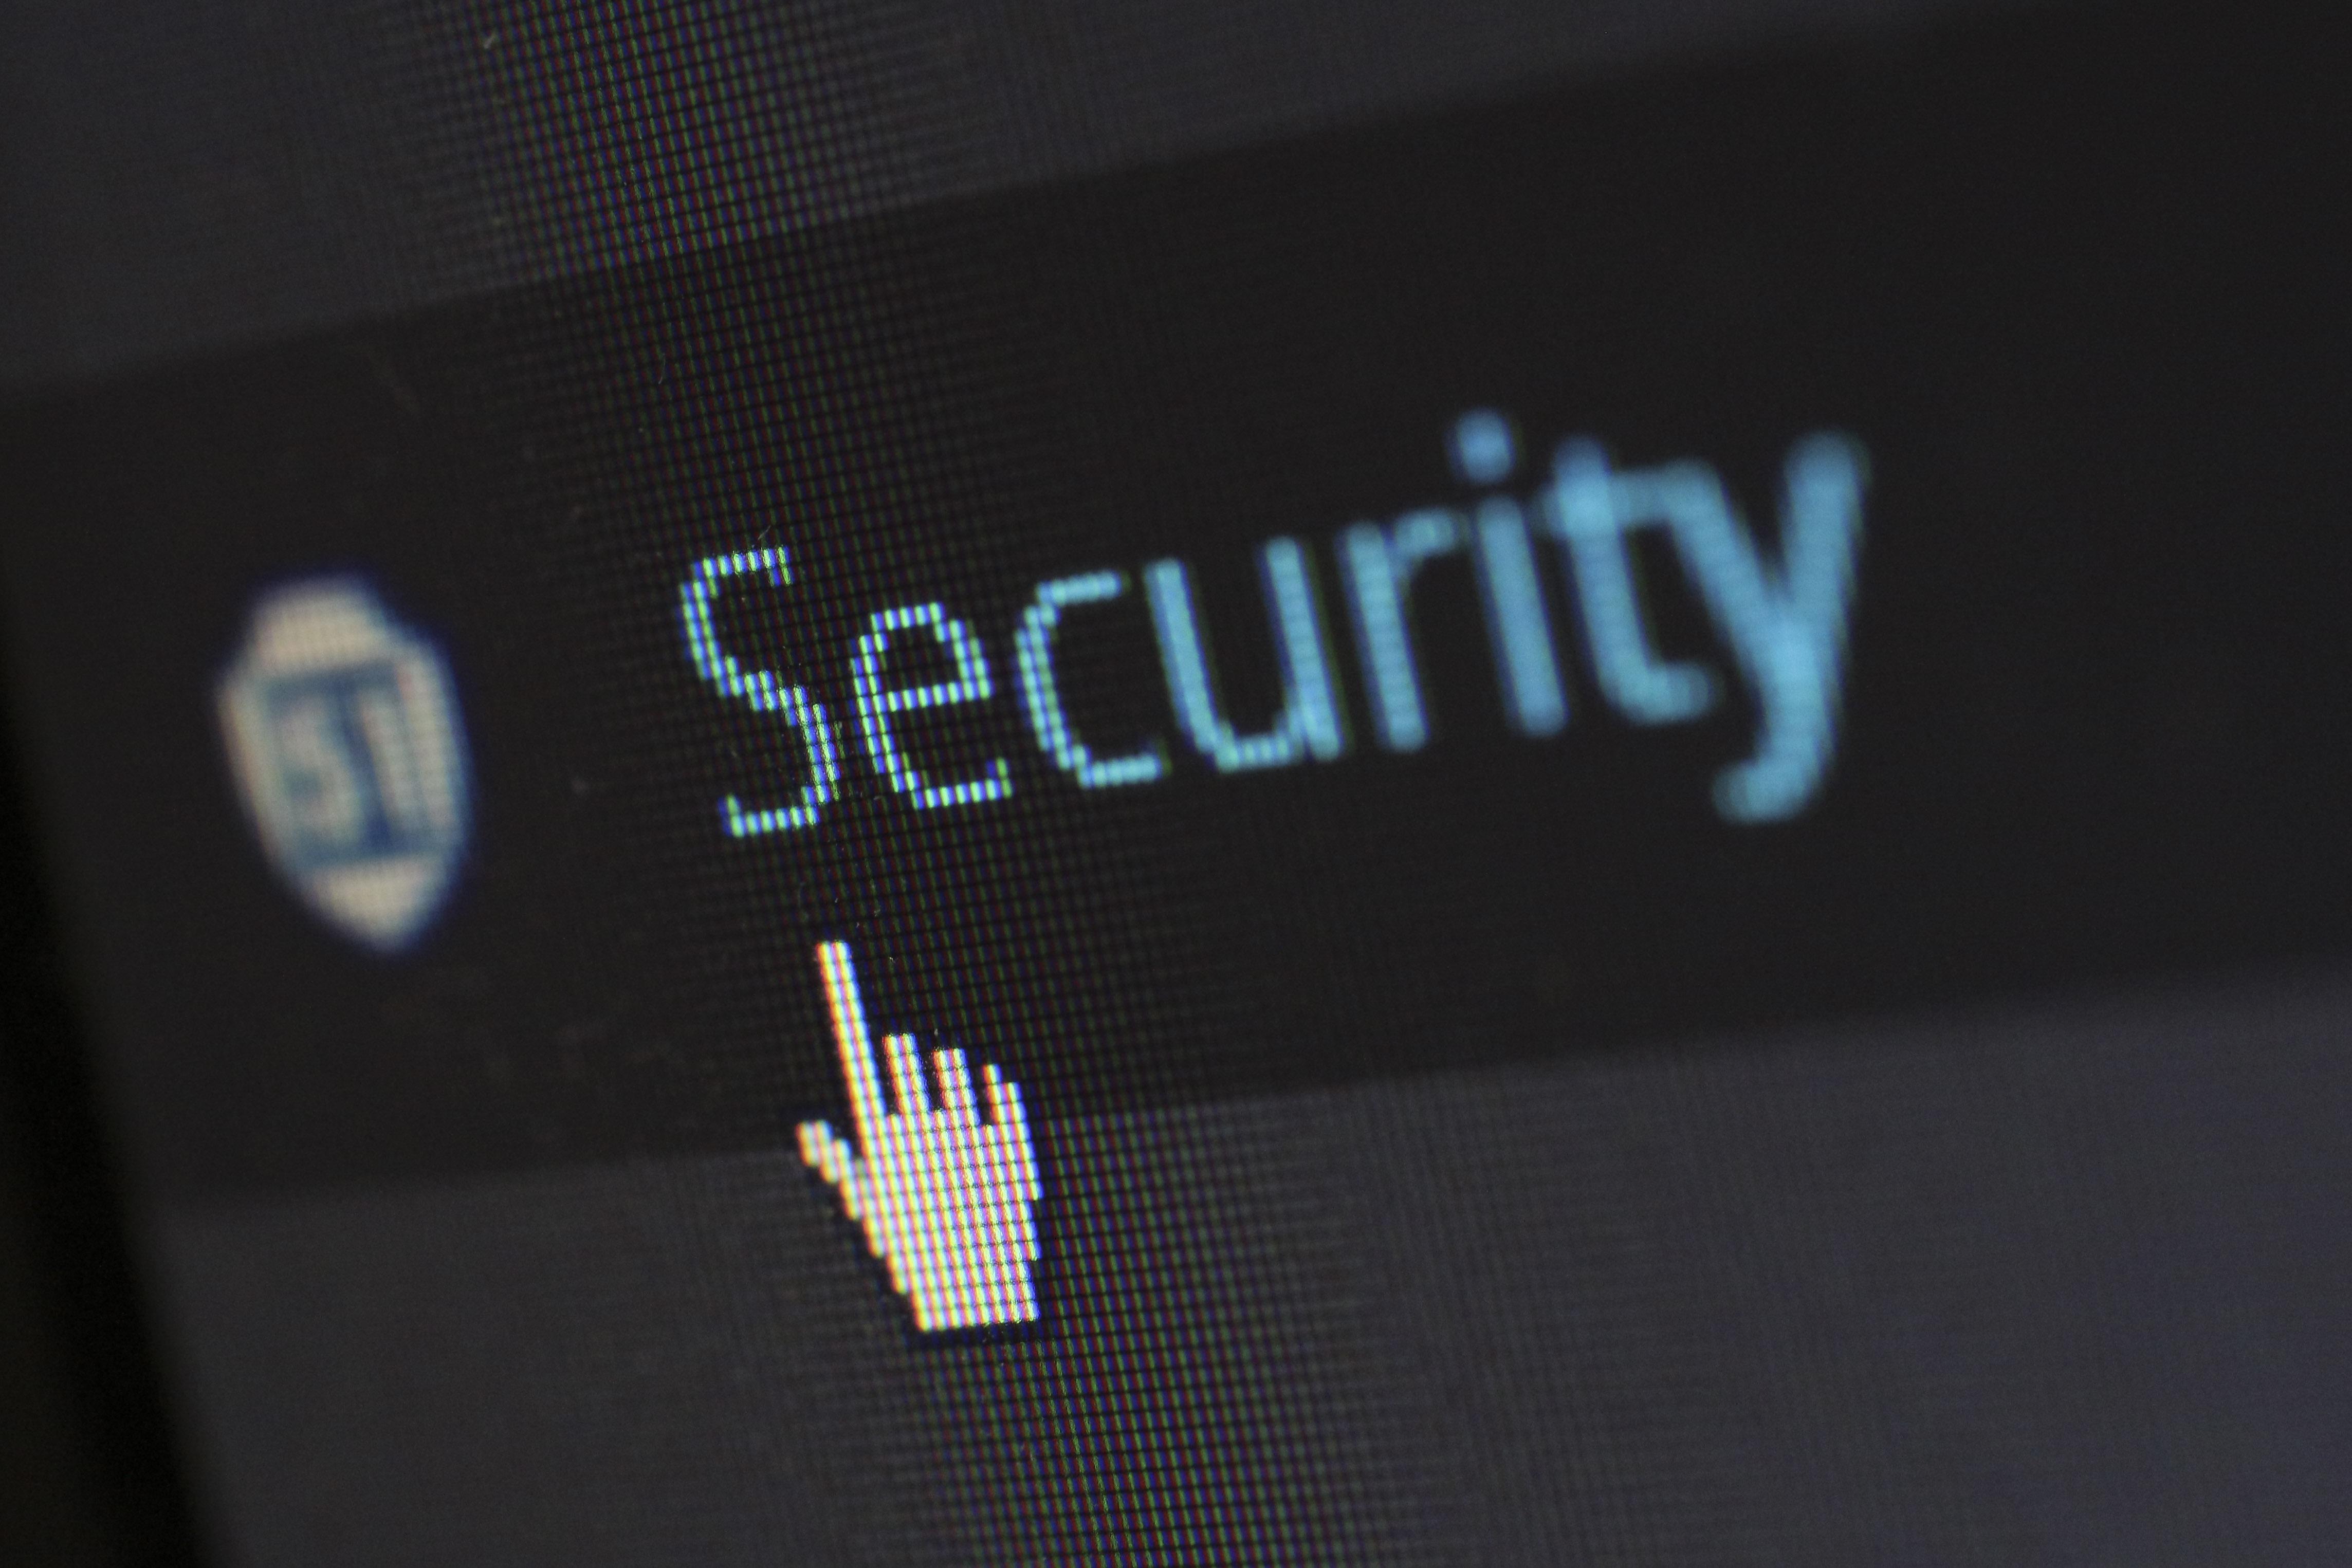 Security_Image.jpeg